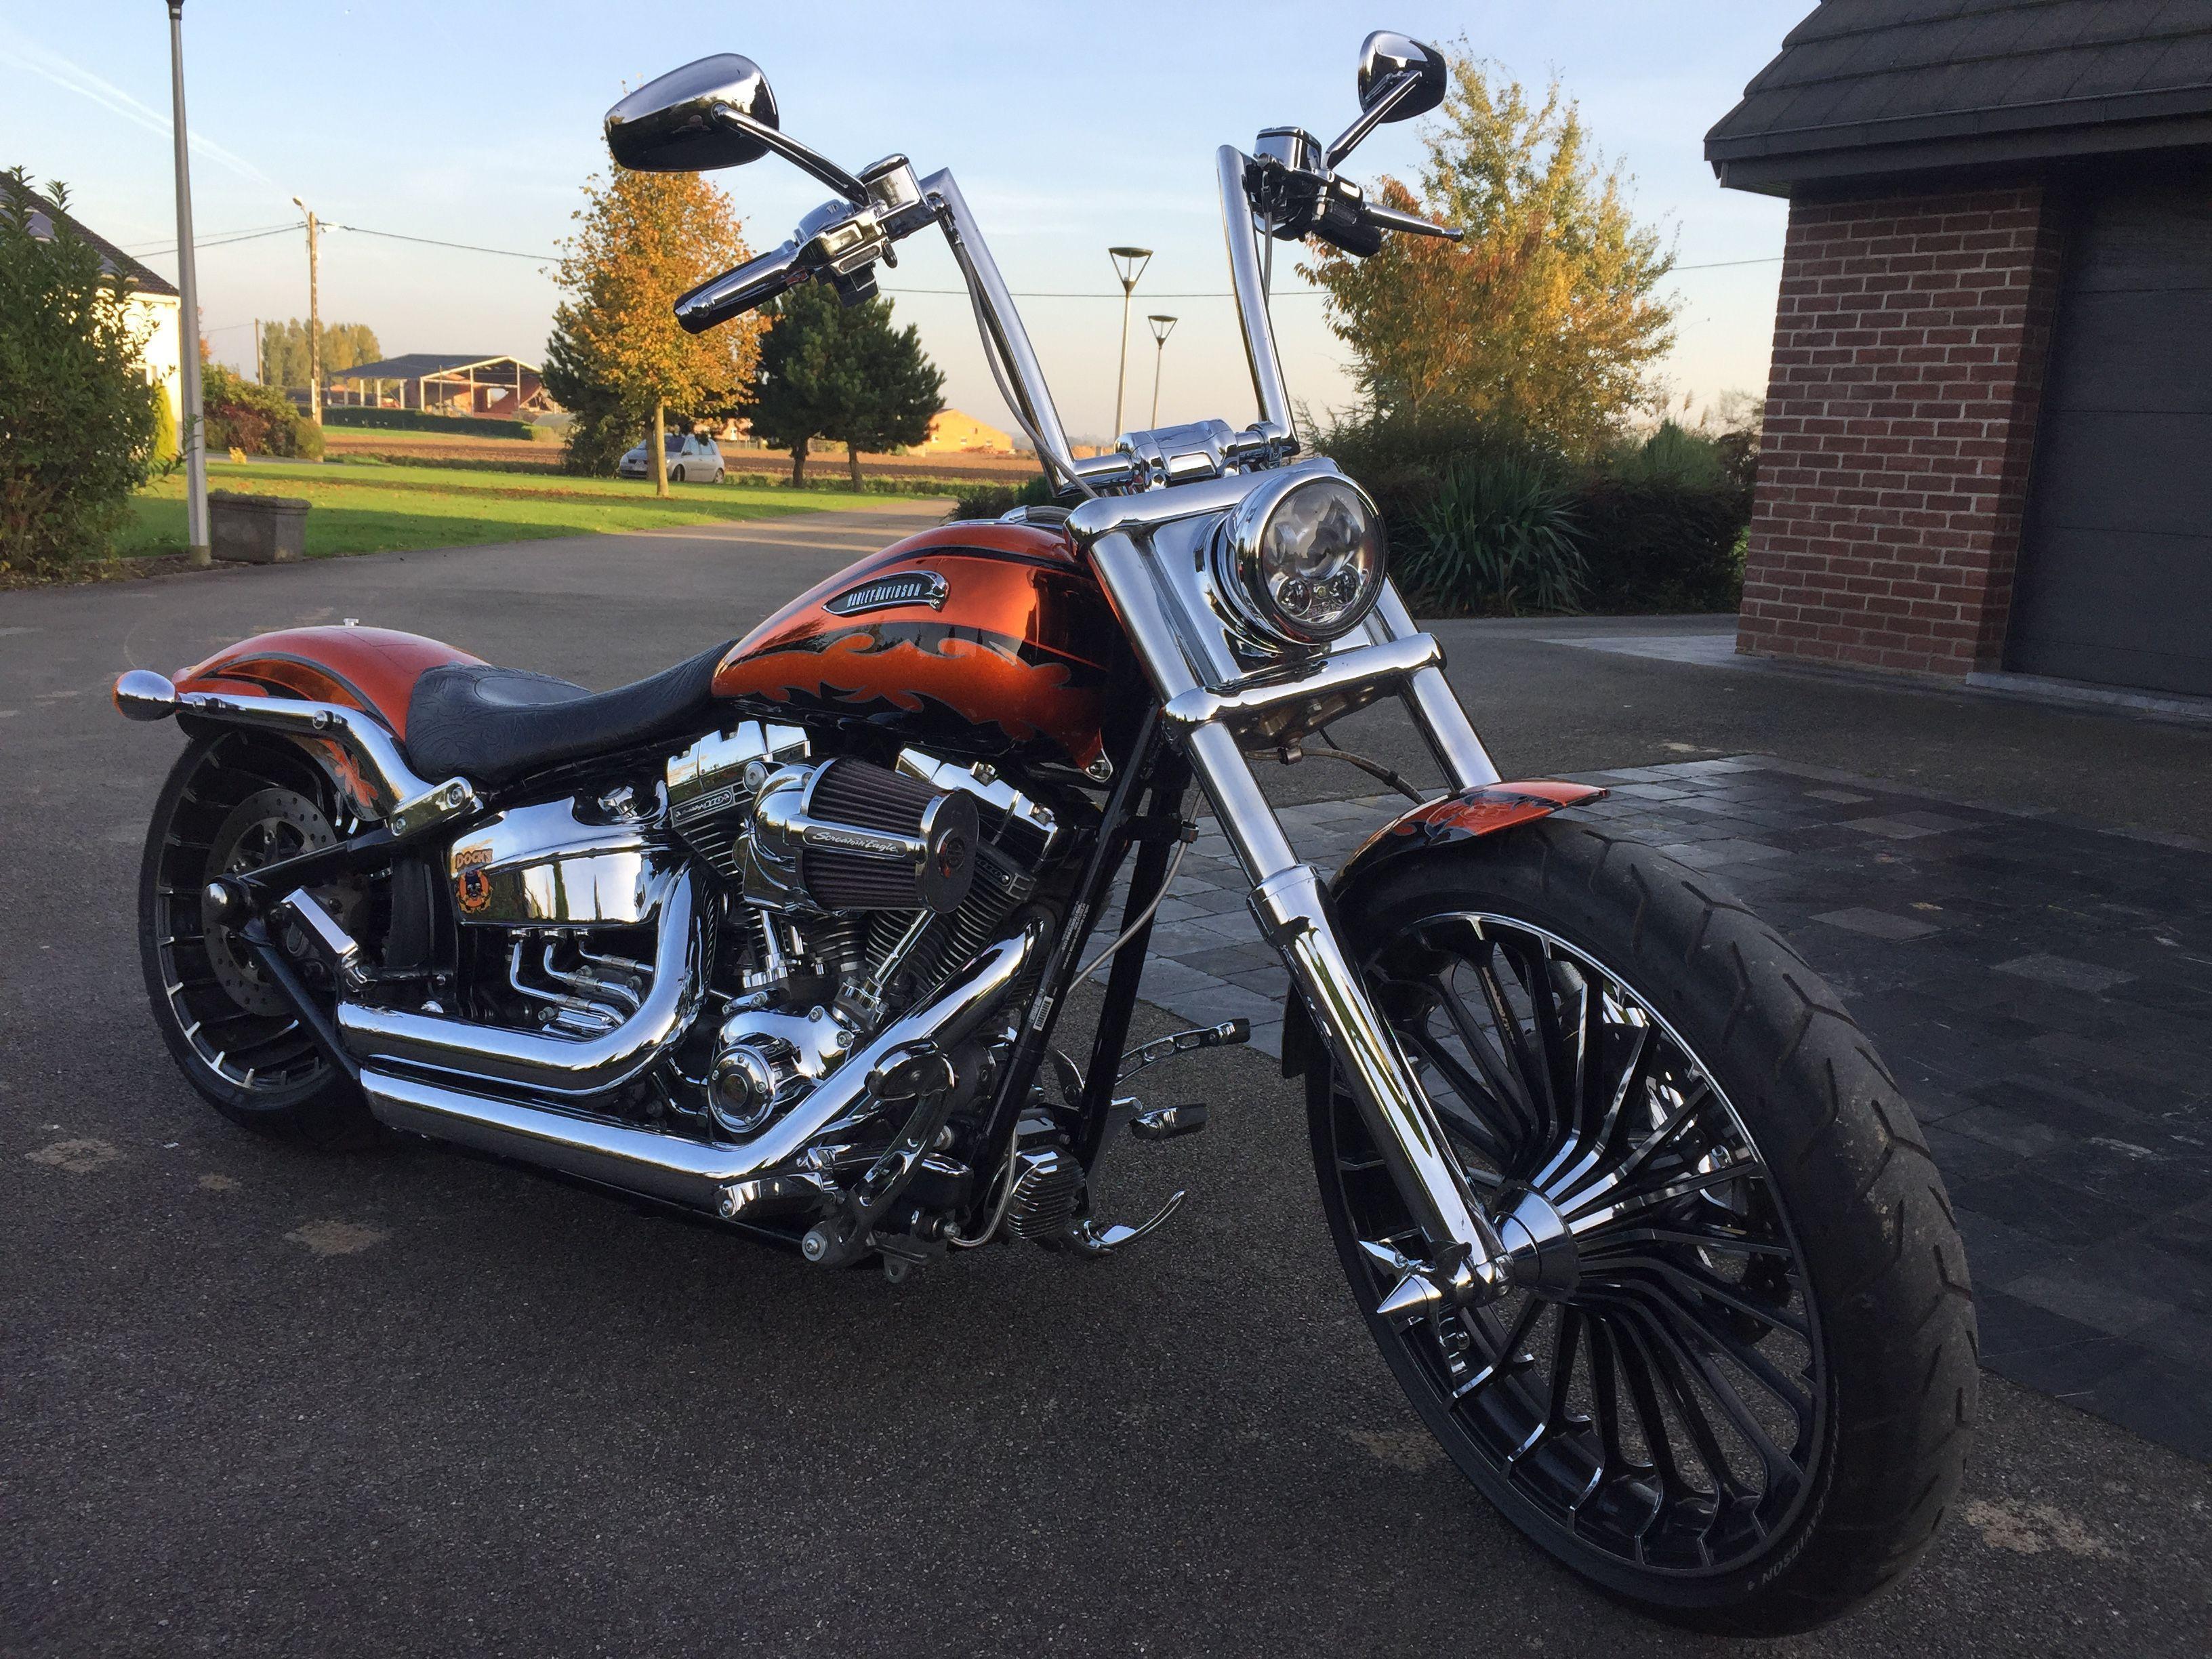 Softail Breakout Cvo Ape Hanger Harleydavidsonchoppersapehangers Harleydavidsonchopperscustombobber Harley Davidson Chopper Harley Davidson Harley